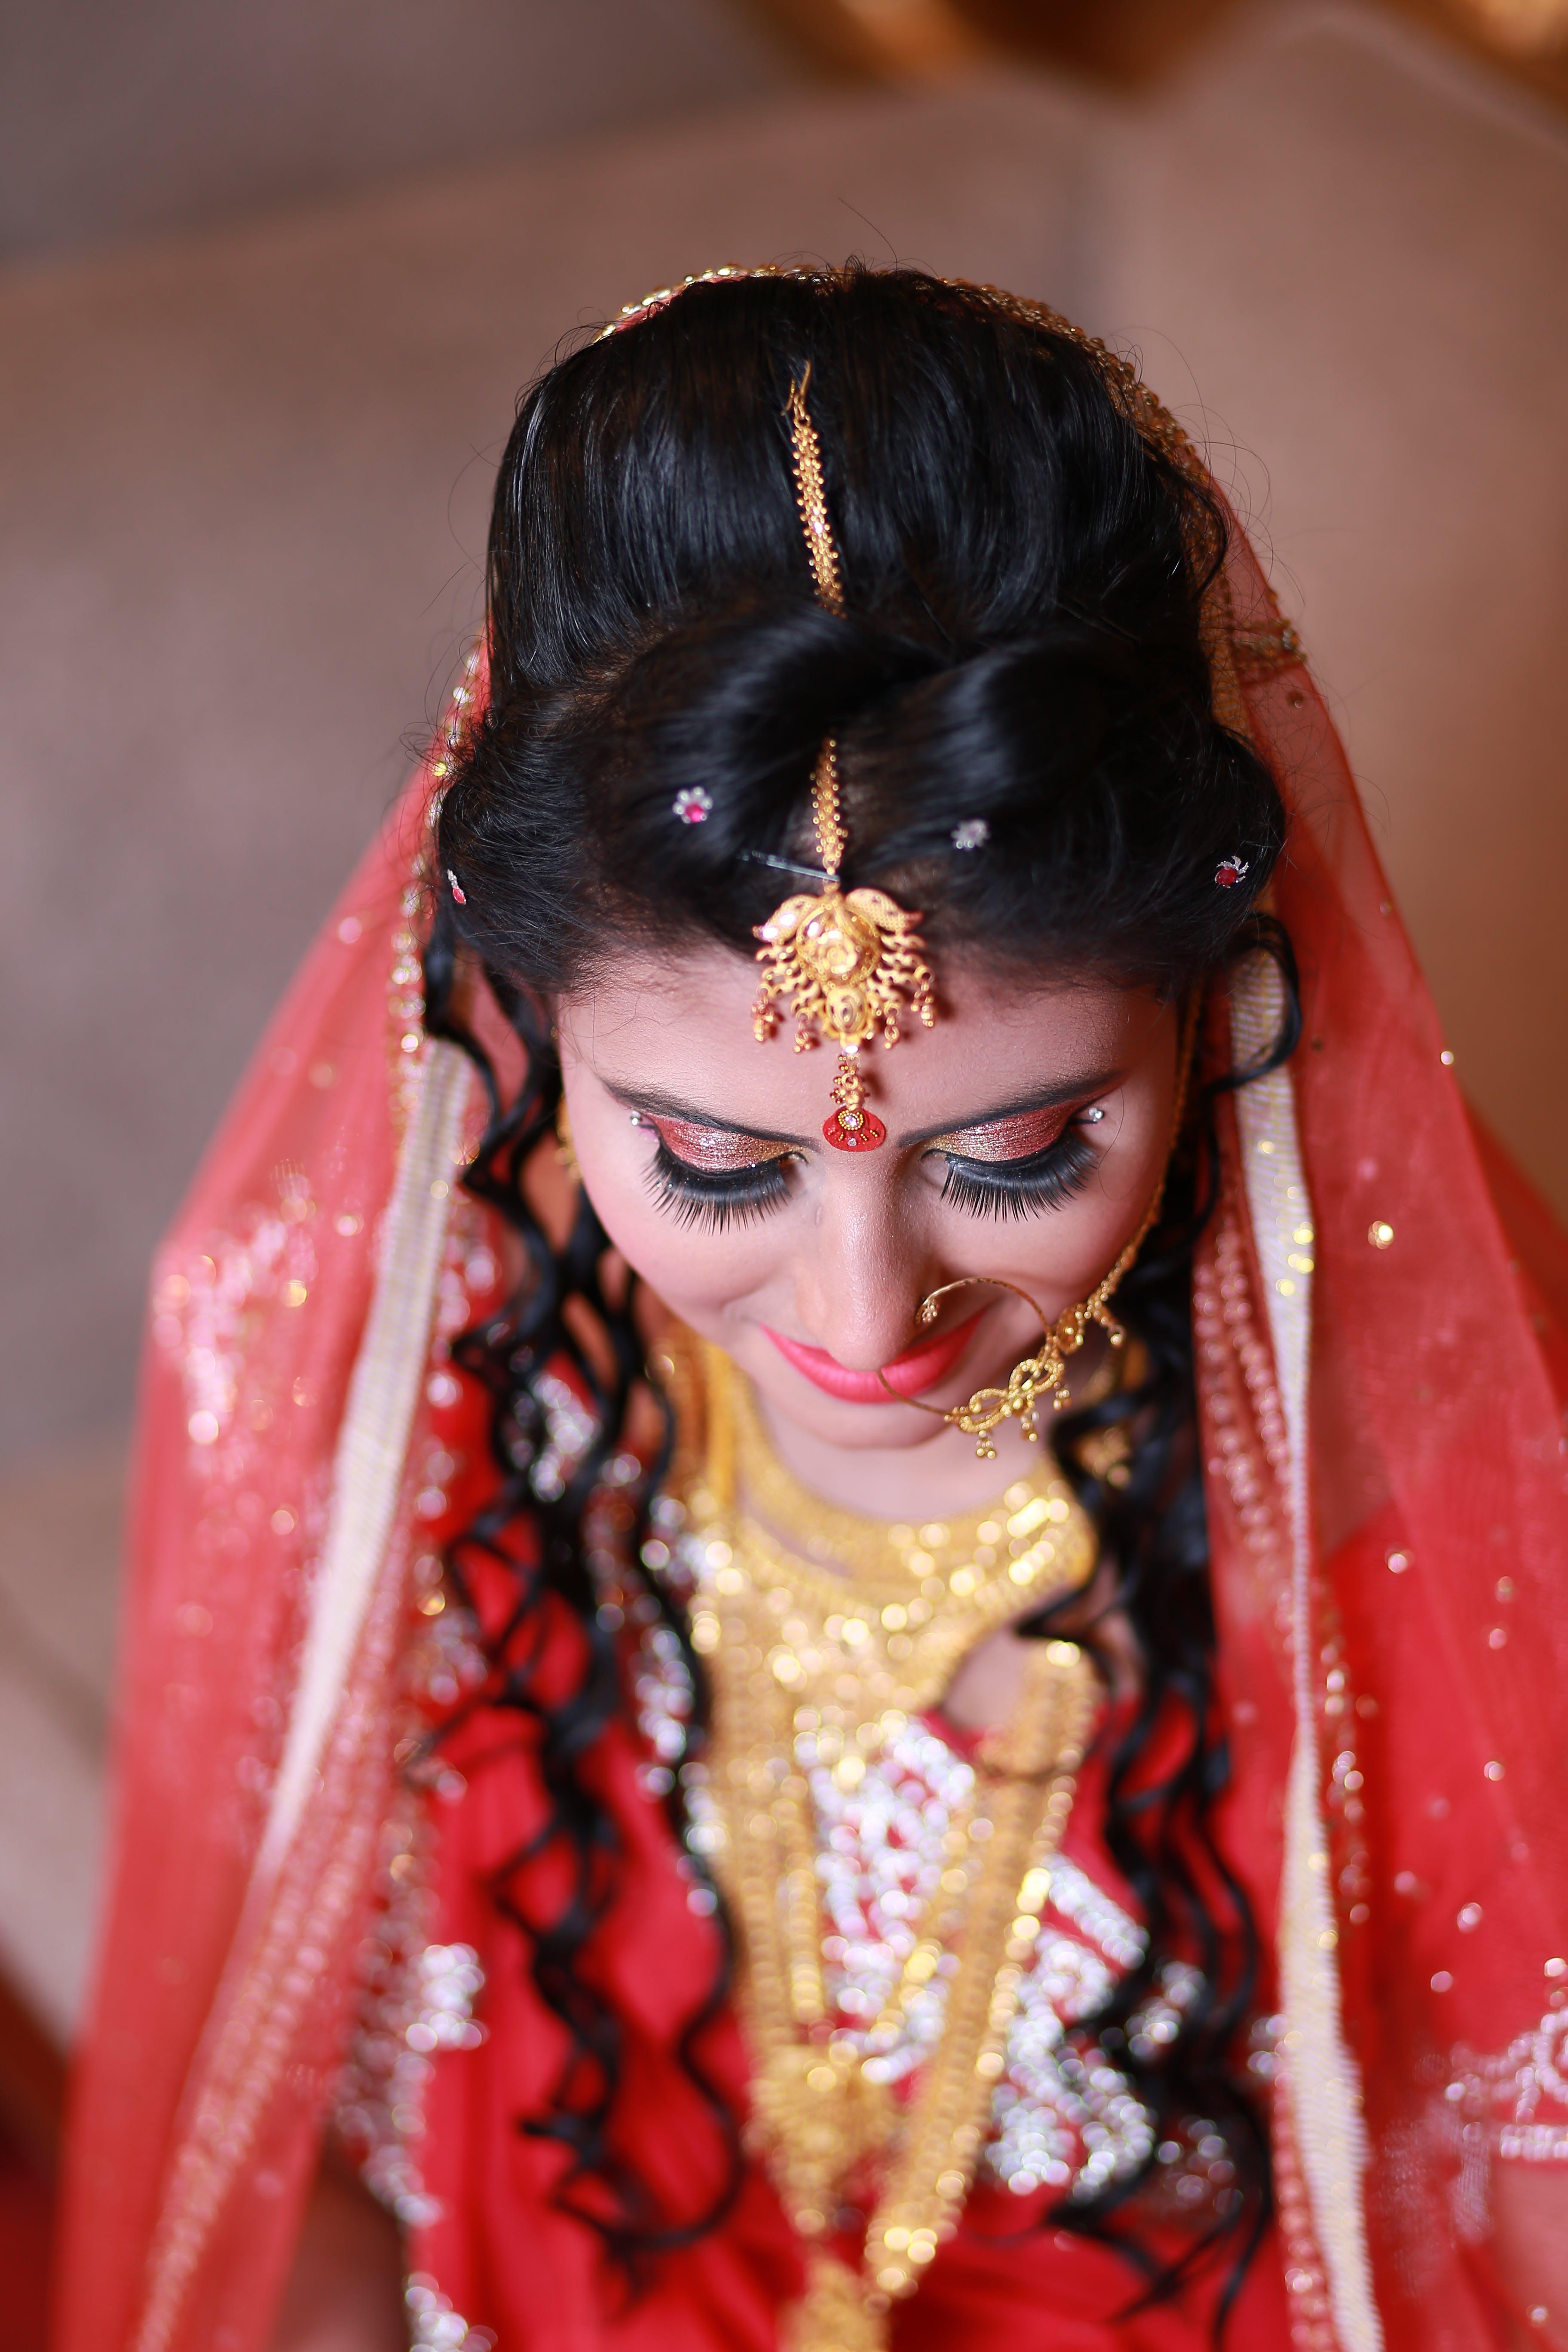 Woman Wearing Red and White Sari